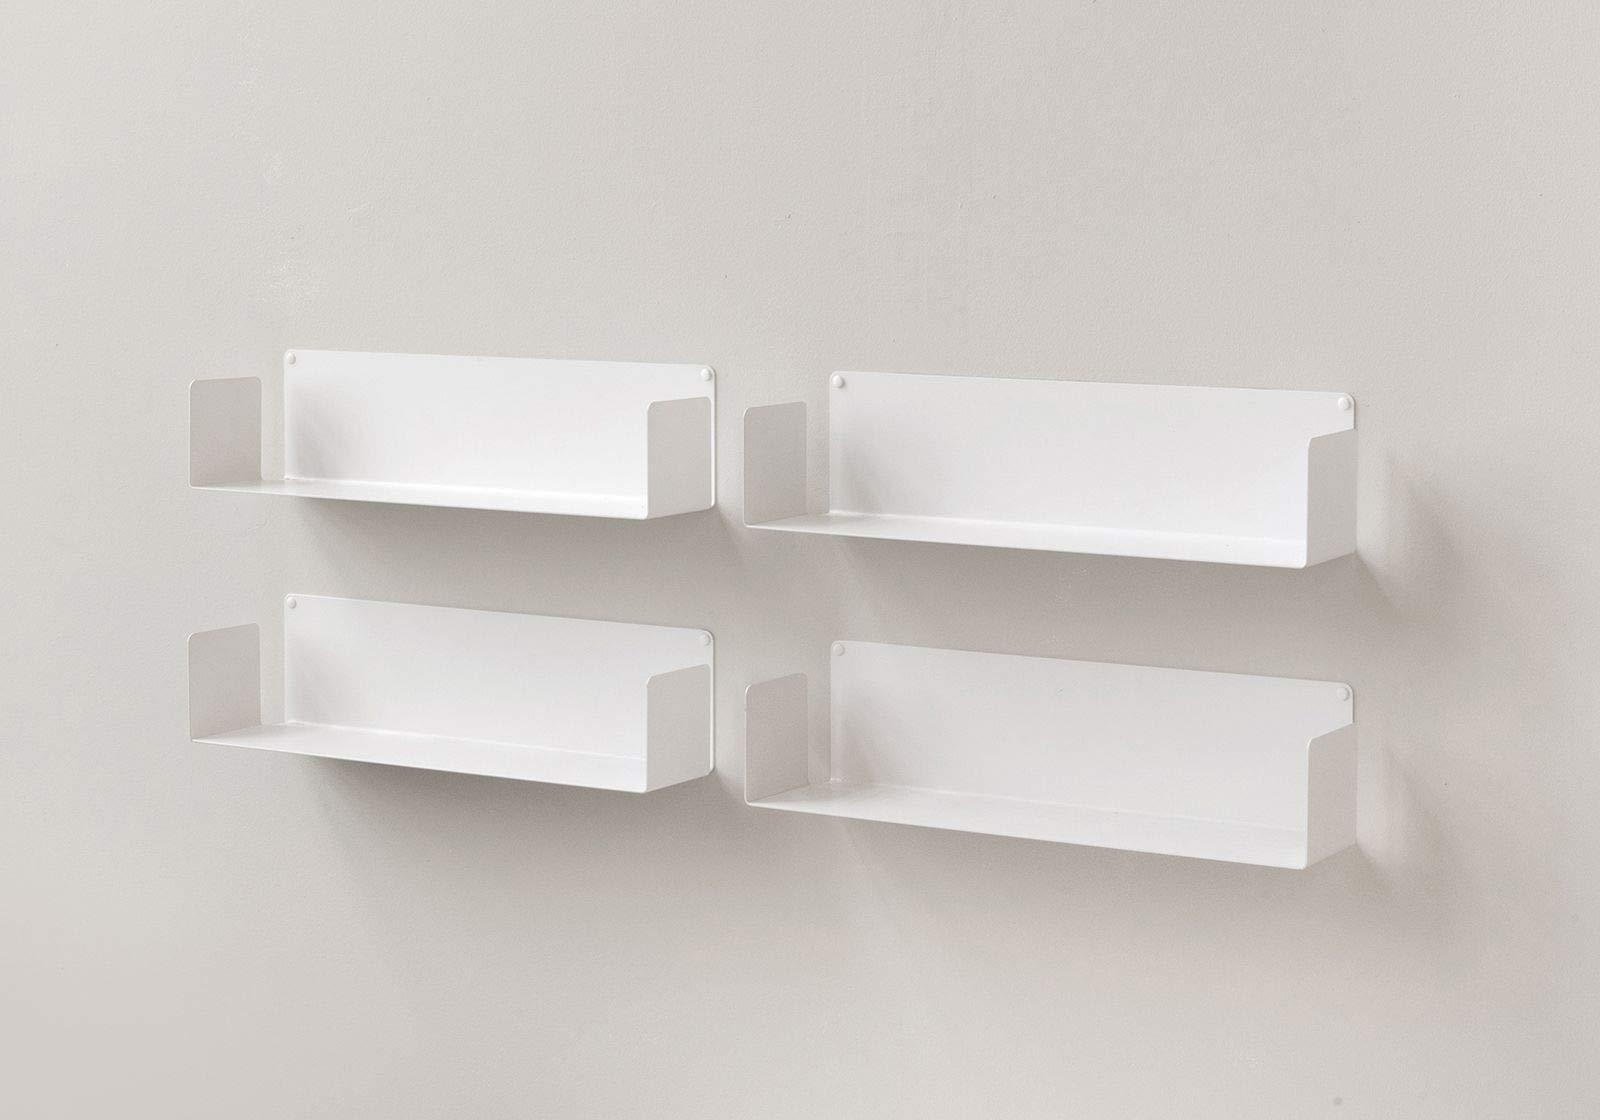 te ebooks shelf for books u stainless steel white 60 x 15 x 15 cm